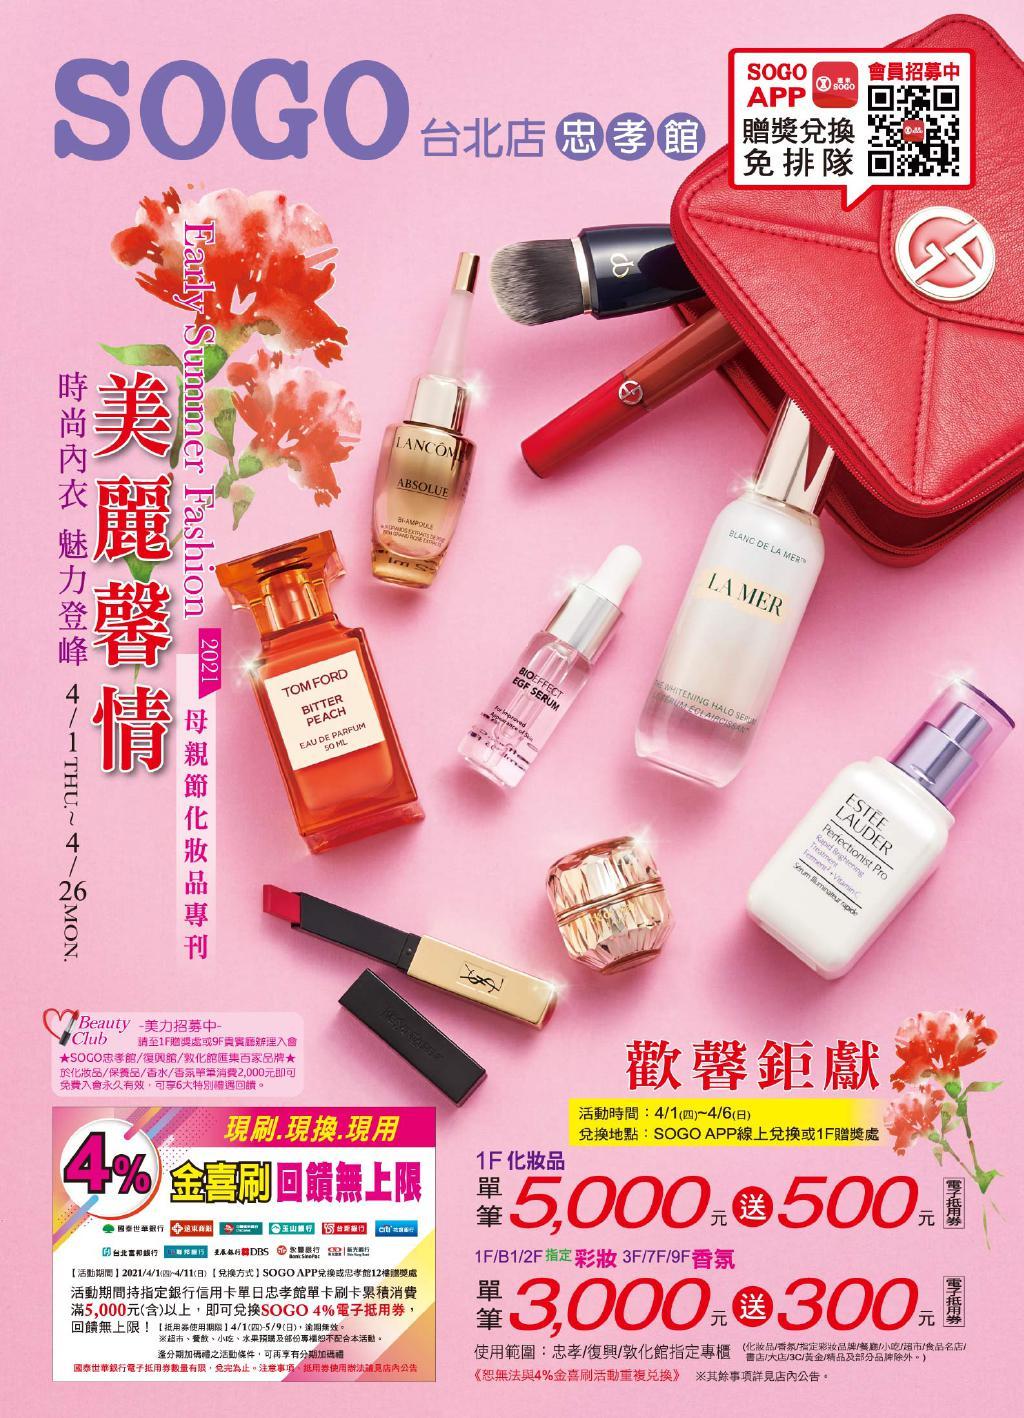 SOGO《台北忠孝館》DM 「「美麗馨情」2021母親節化妝品專刊」【2021/4/26 止】